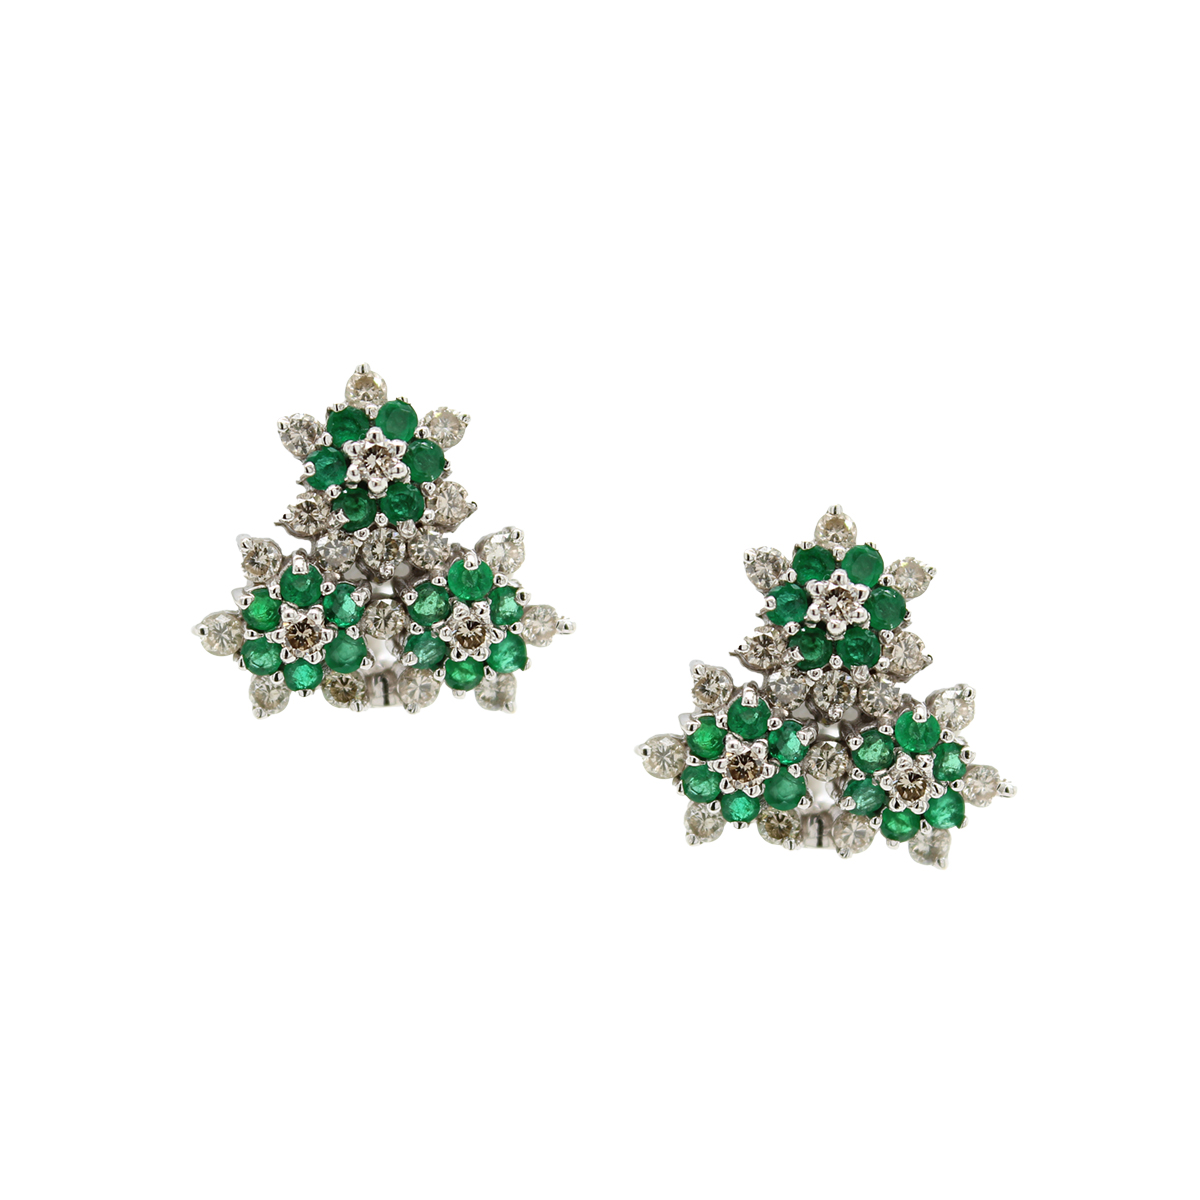 Vintage 18 Karat White Gold Emerald and Diamond Earrings